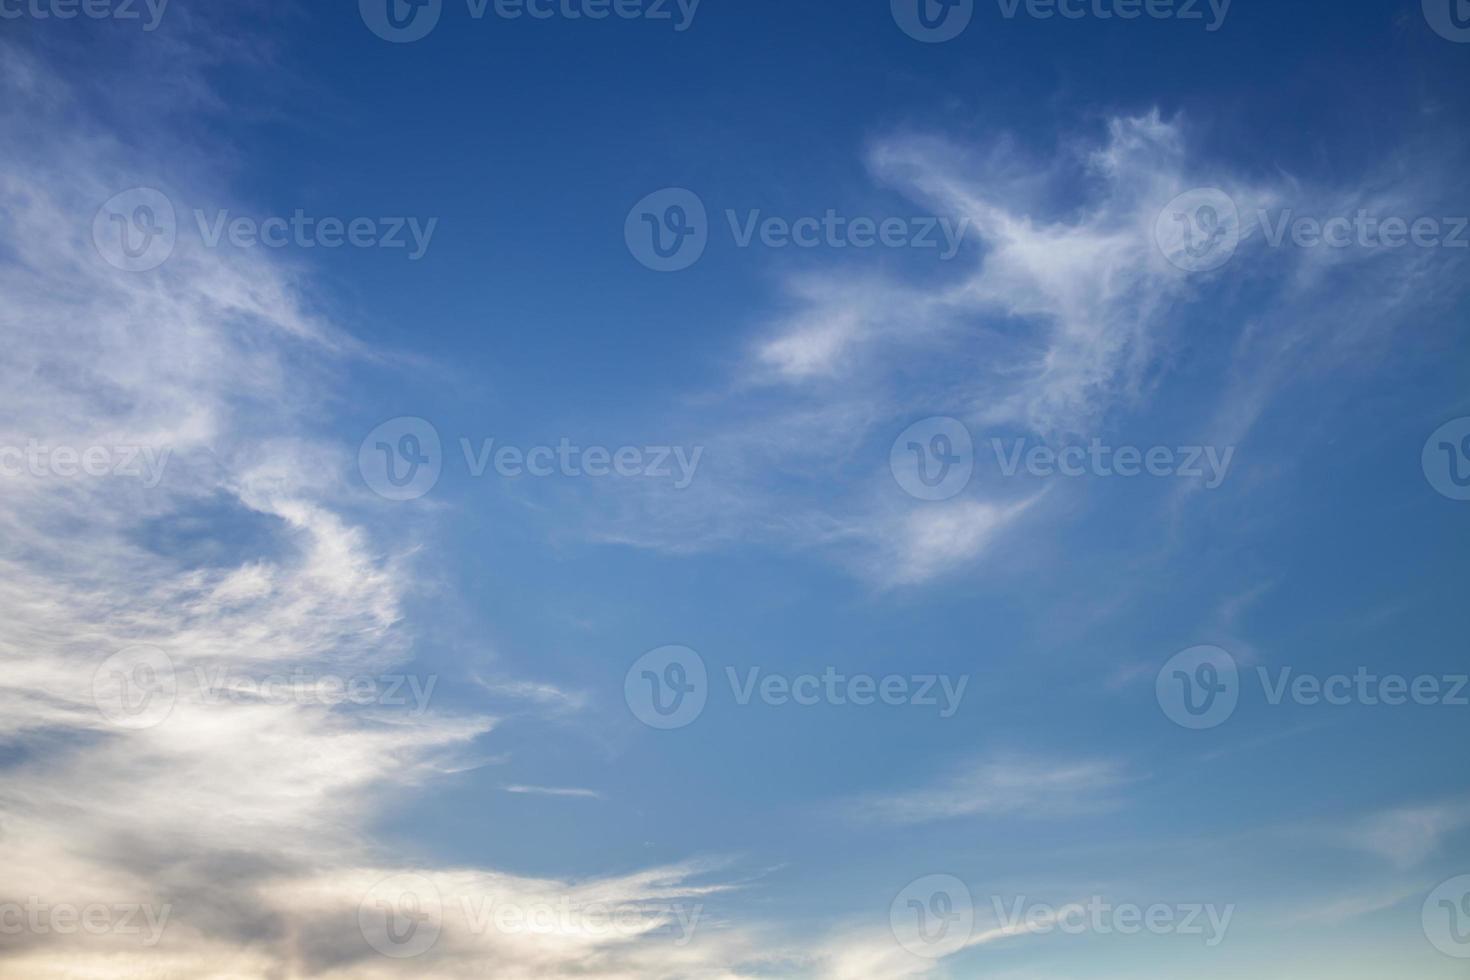 piekerige wolken in een blauwe lucht foto